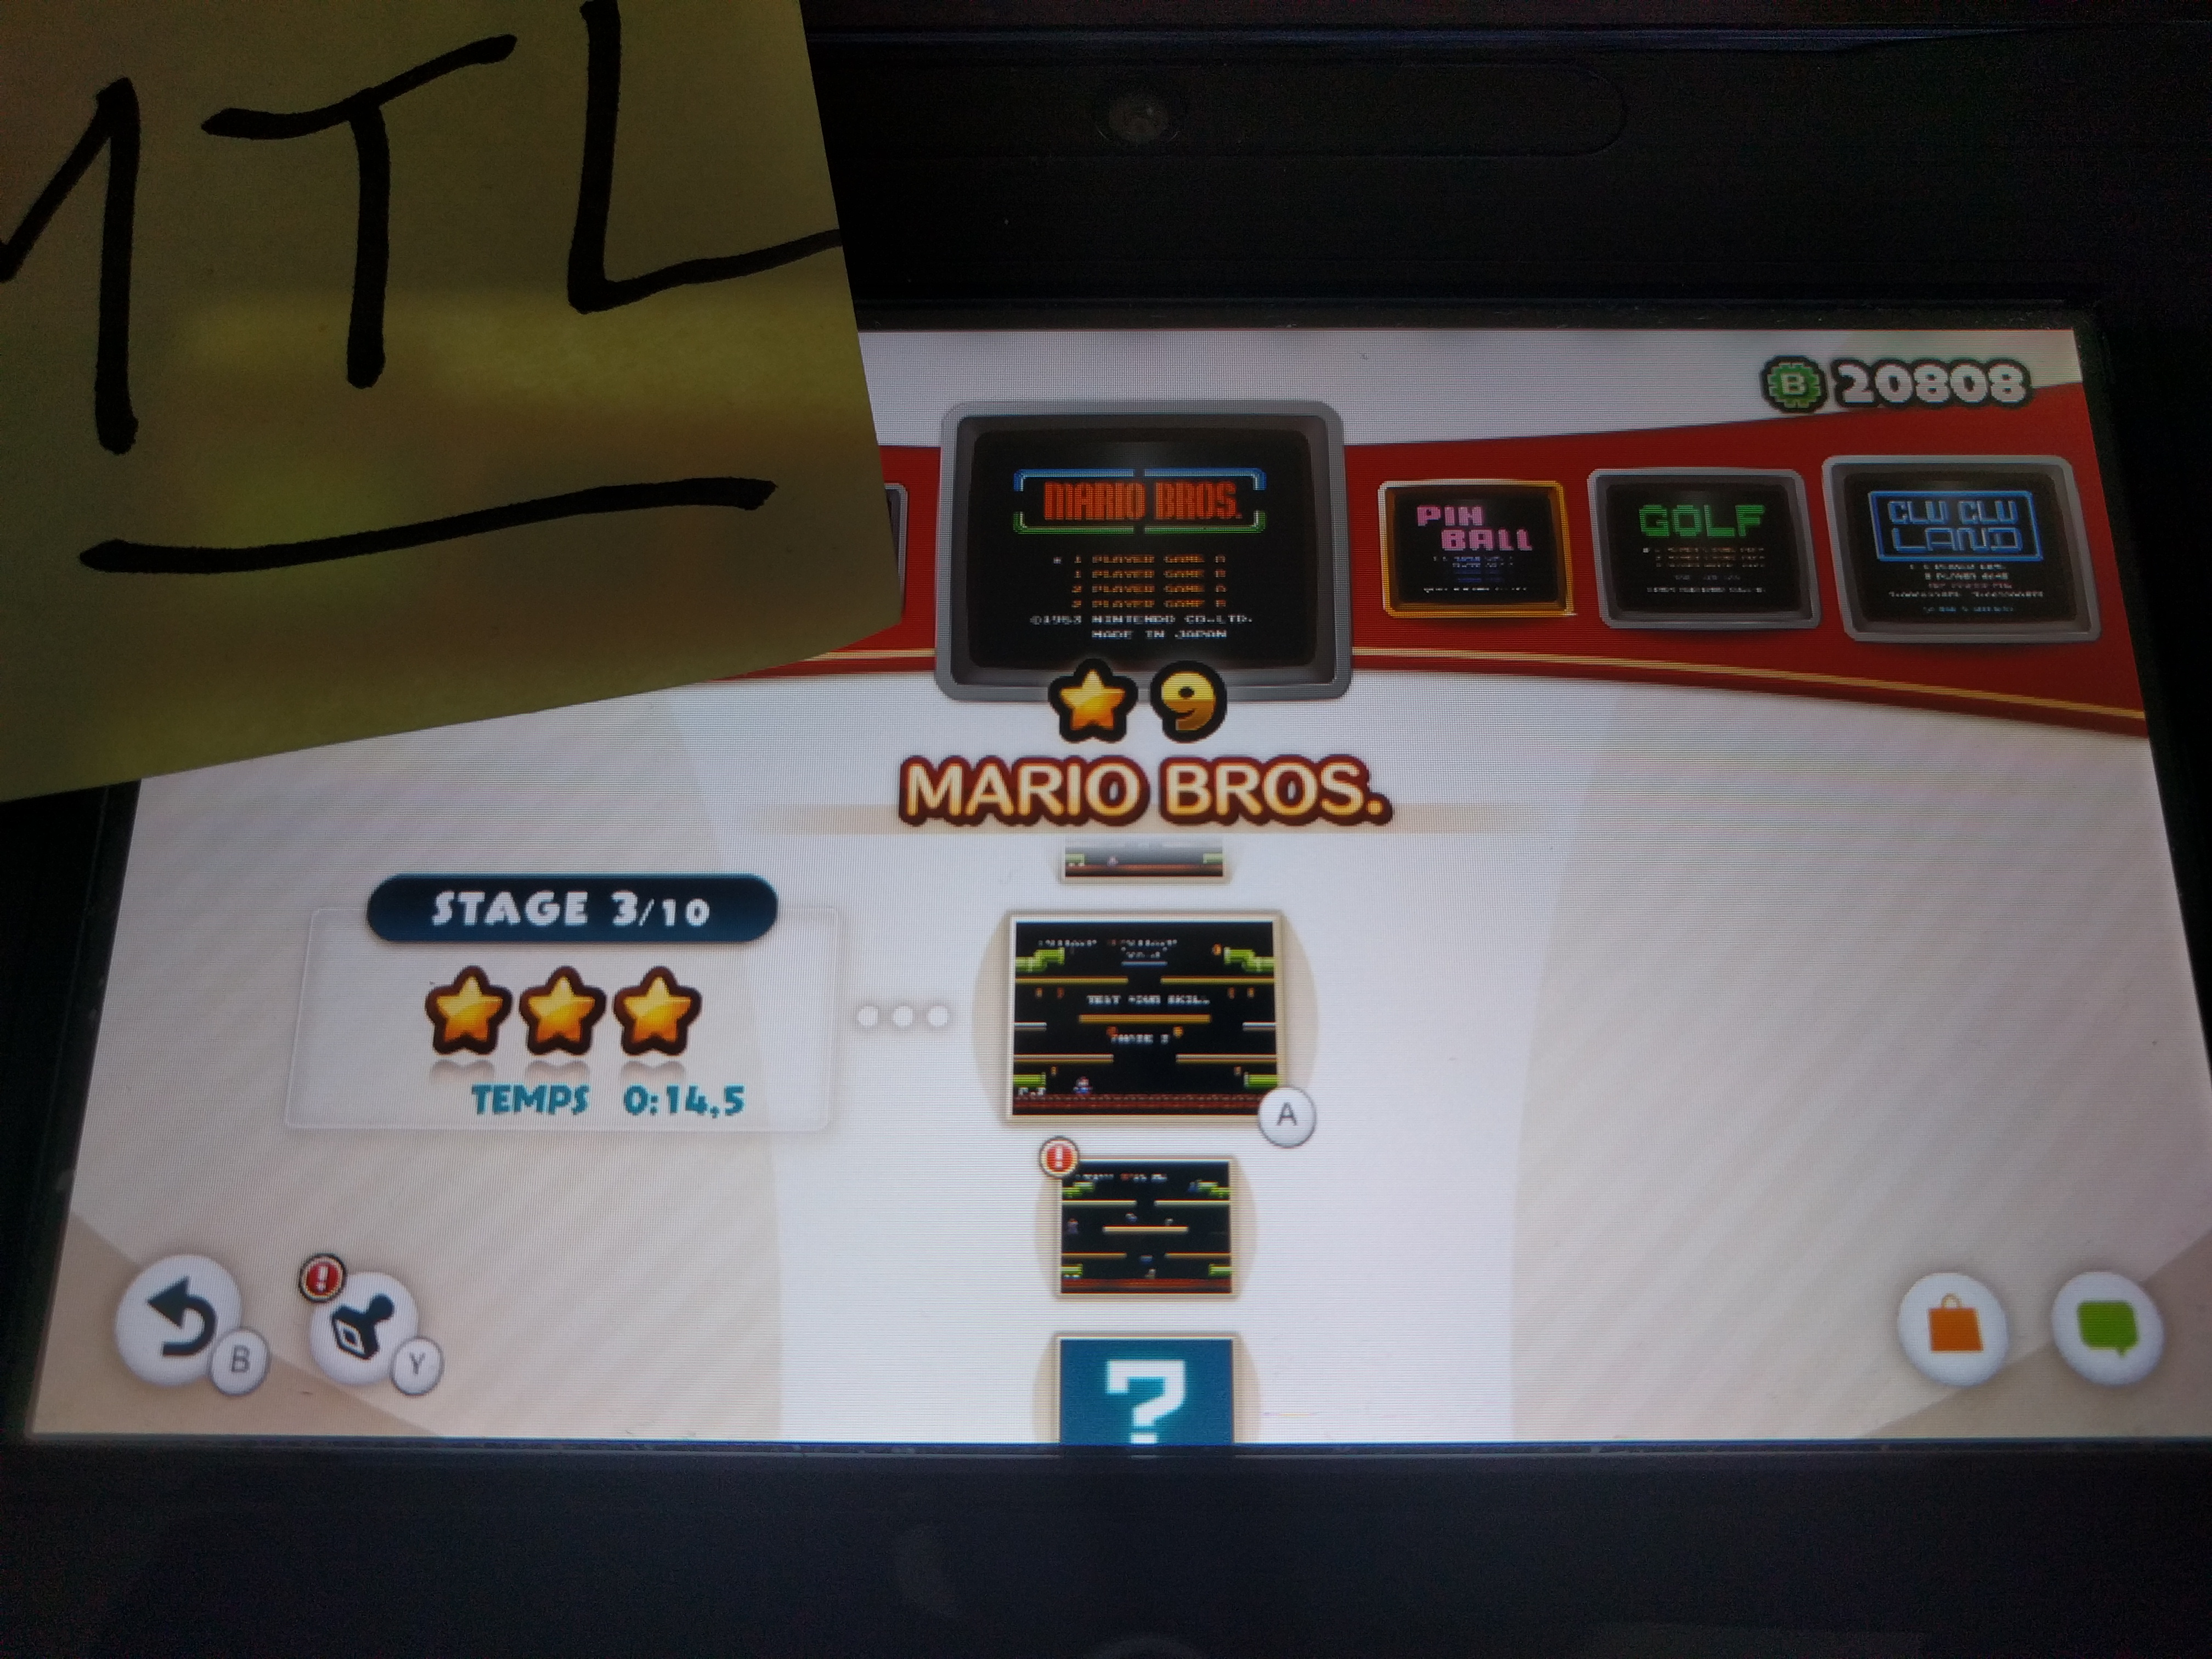 Mantalow: NES Remix: Mario Bros: Stage 3 (Wii U) 0:00:14.5 points on 2016-06-10 01:53:14